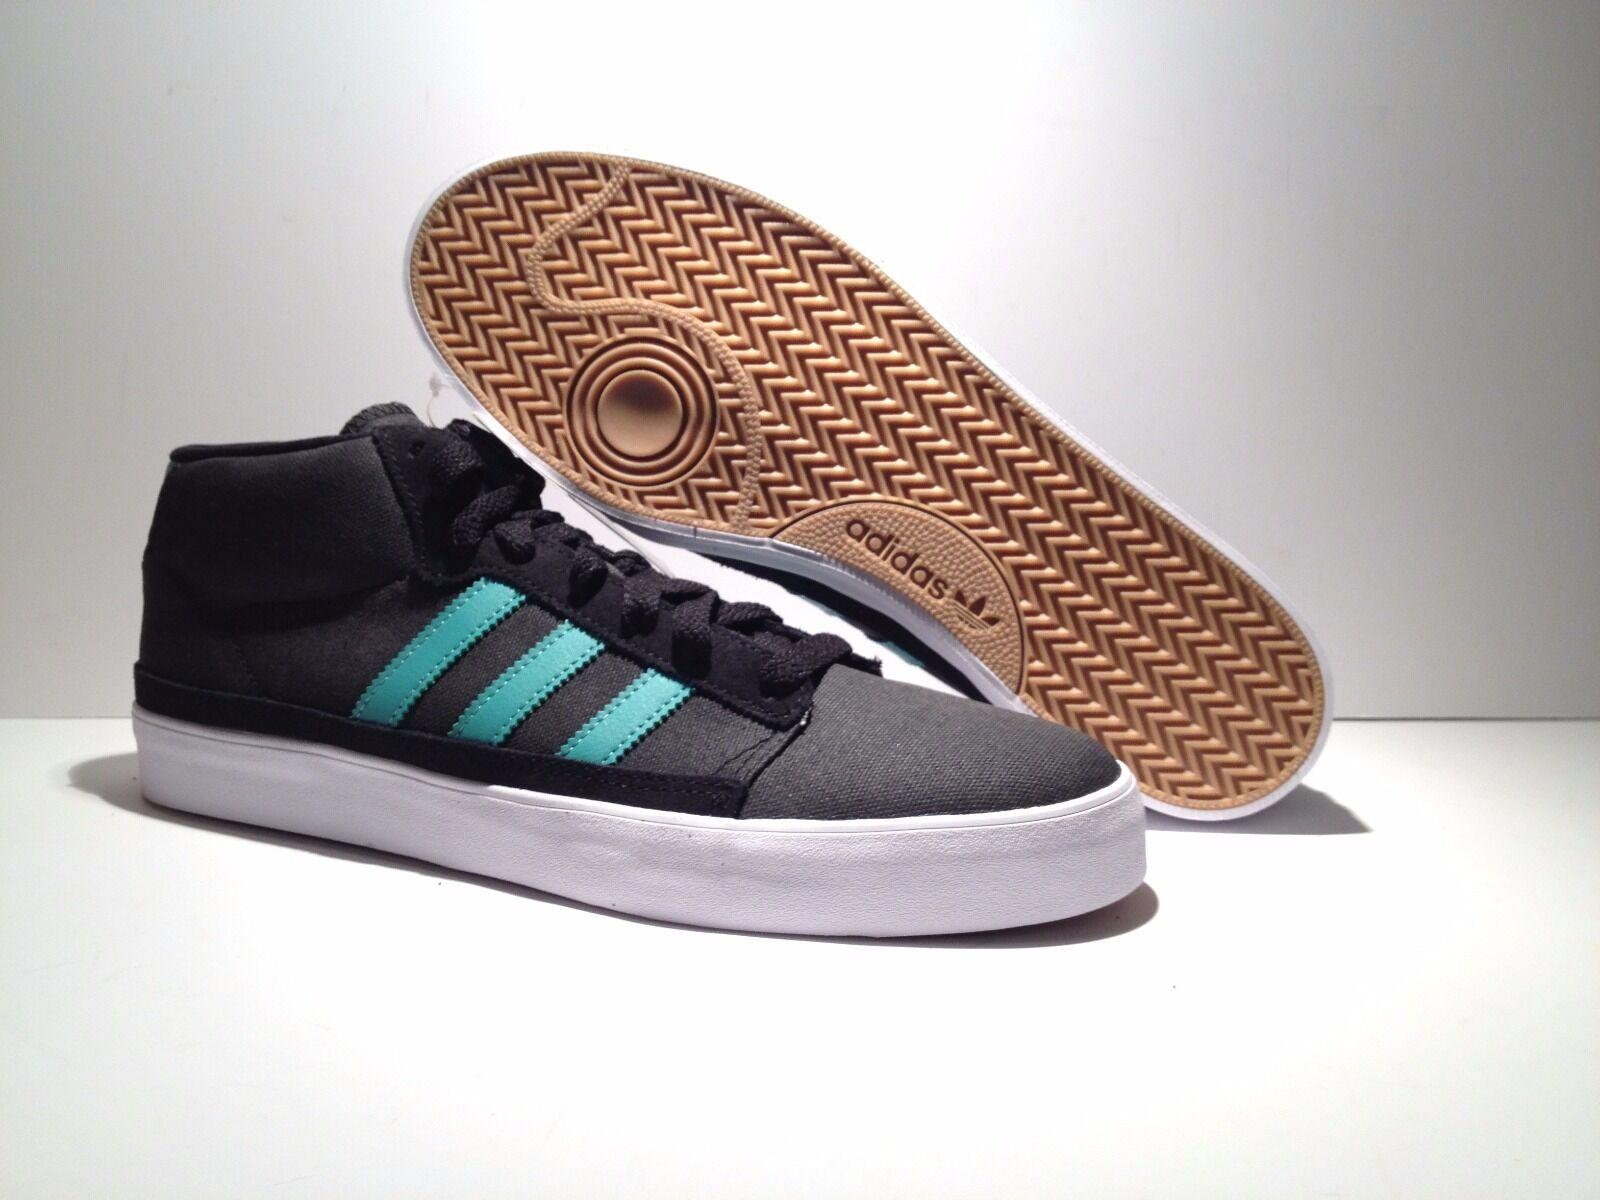 adidas - originals rayado mitte männer - adidas skate - schuhe größe 9,5 bdfa4b